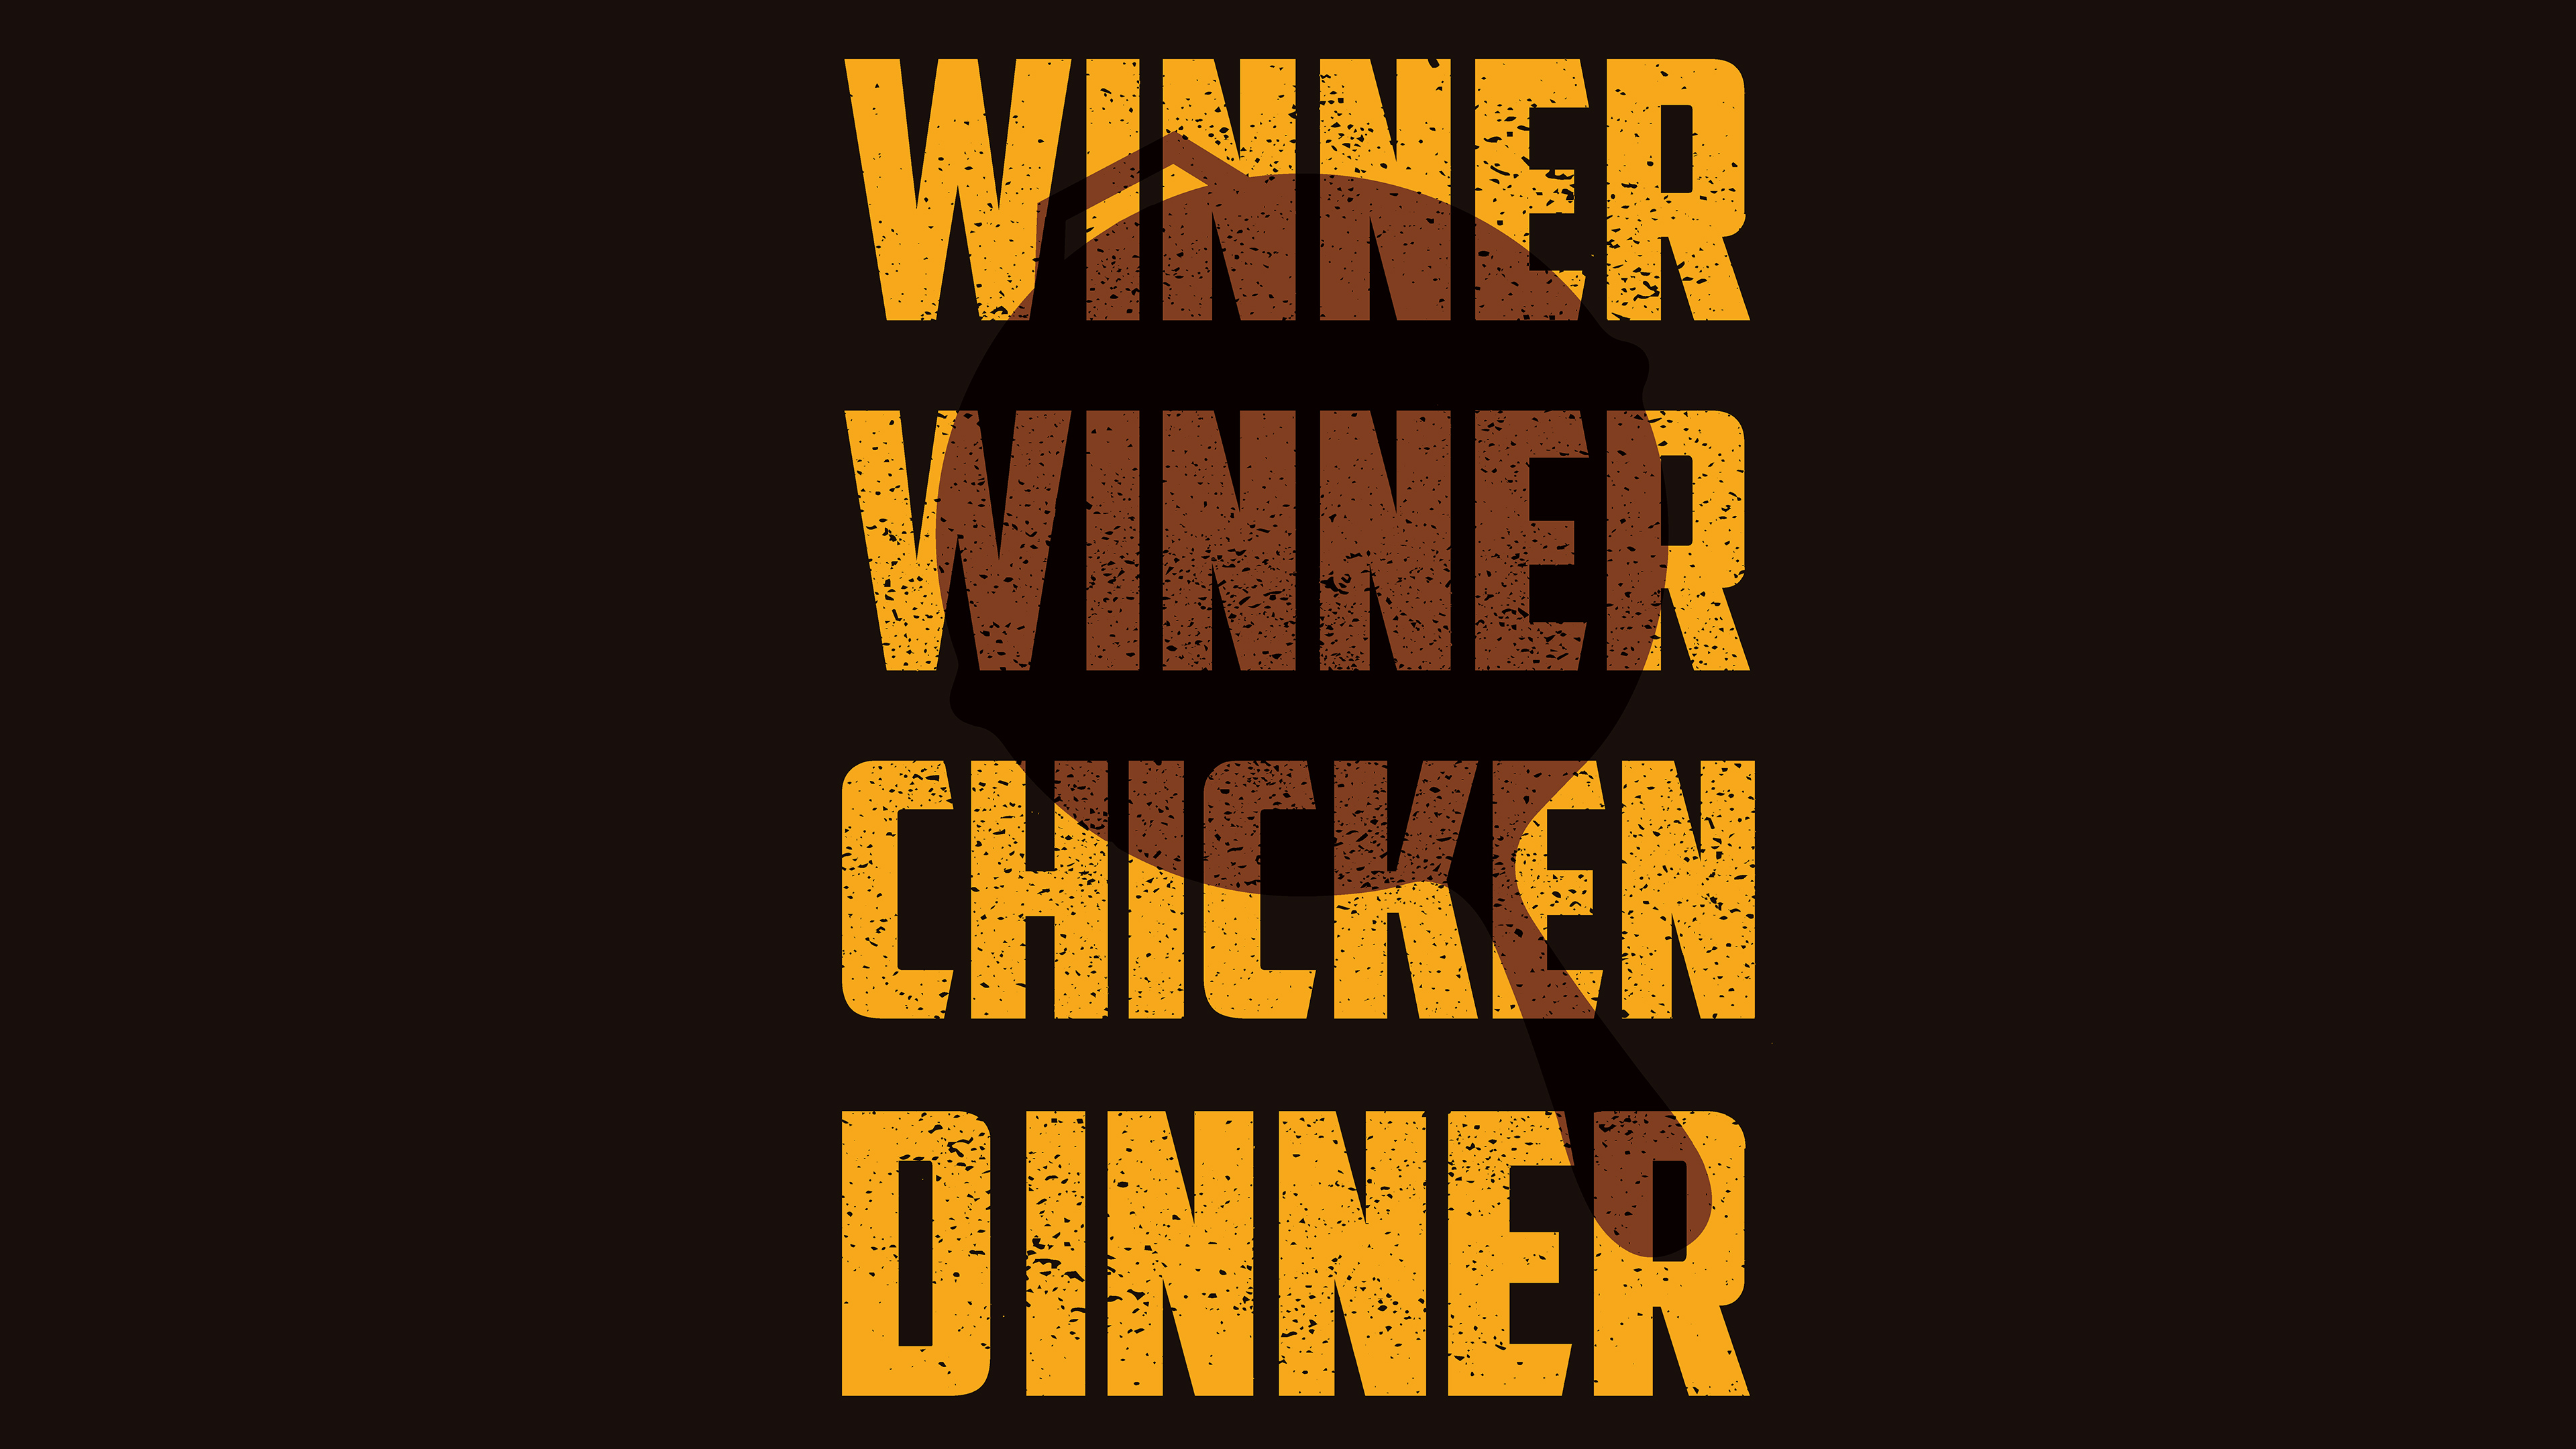 Best Pubg Wallpaper For Iphone: Winner Winner Chicken Dinner, HD Games, 4k Wallpapers